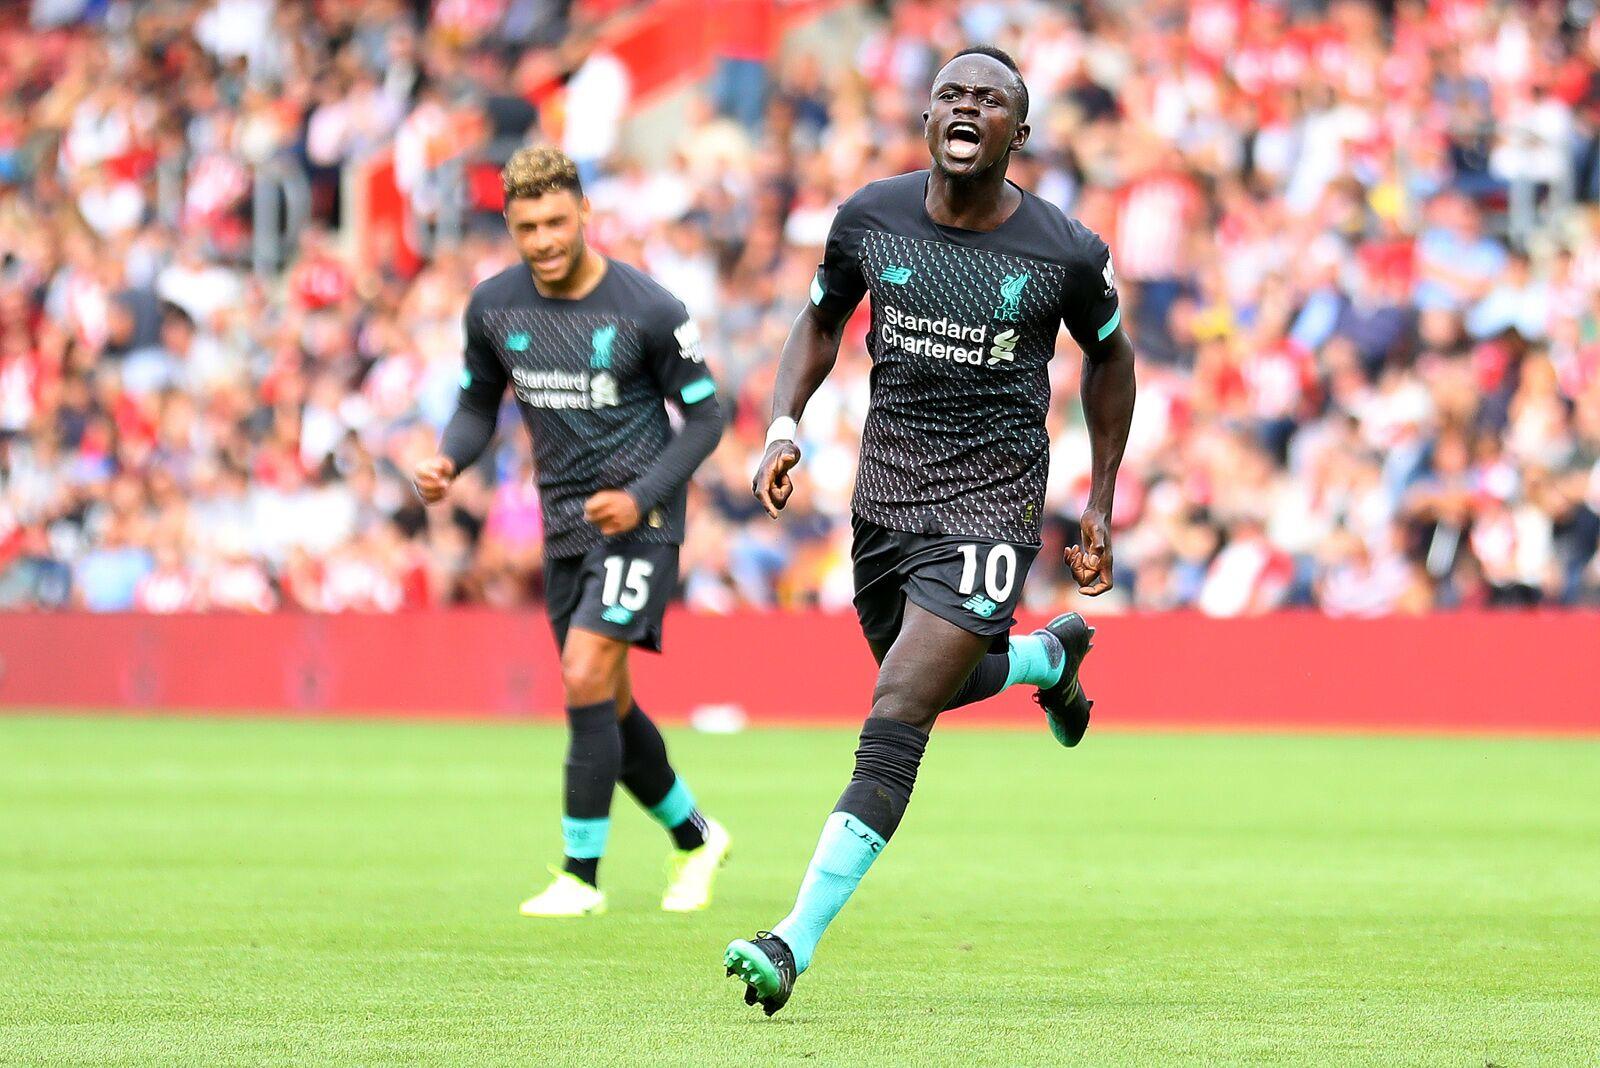 Southampton: Sadio Mane apologises for scoring against former club for Liverpool